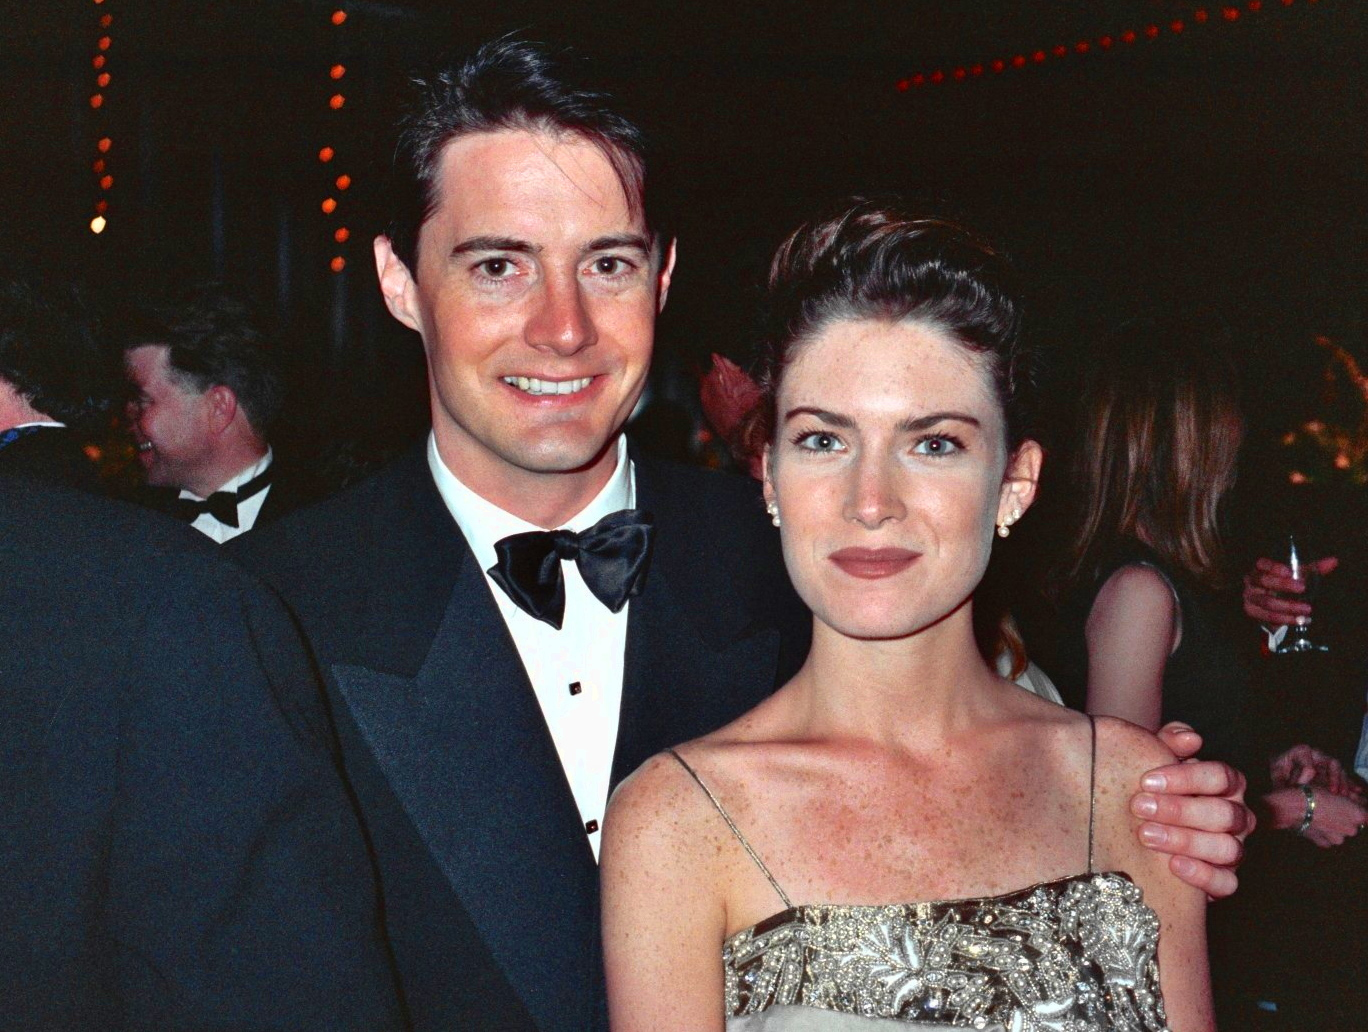 http://upload.wikimedia.org/wikipedia/commons/d/d4/Kyle_MacLachlan_Lara_Flynn_Boyle_Emmy_Awards_1990.jpg